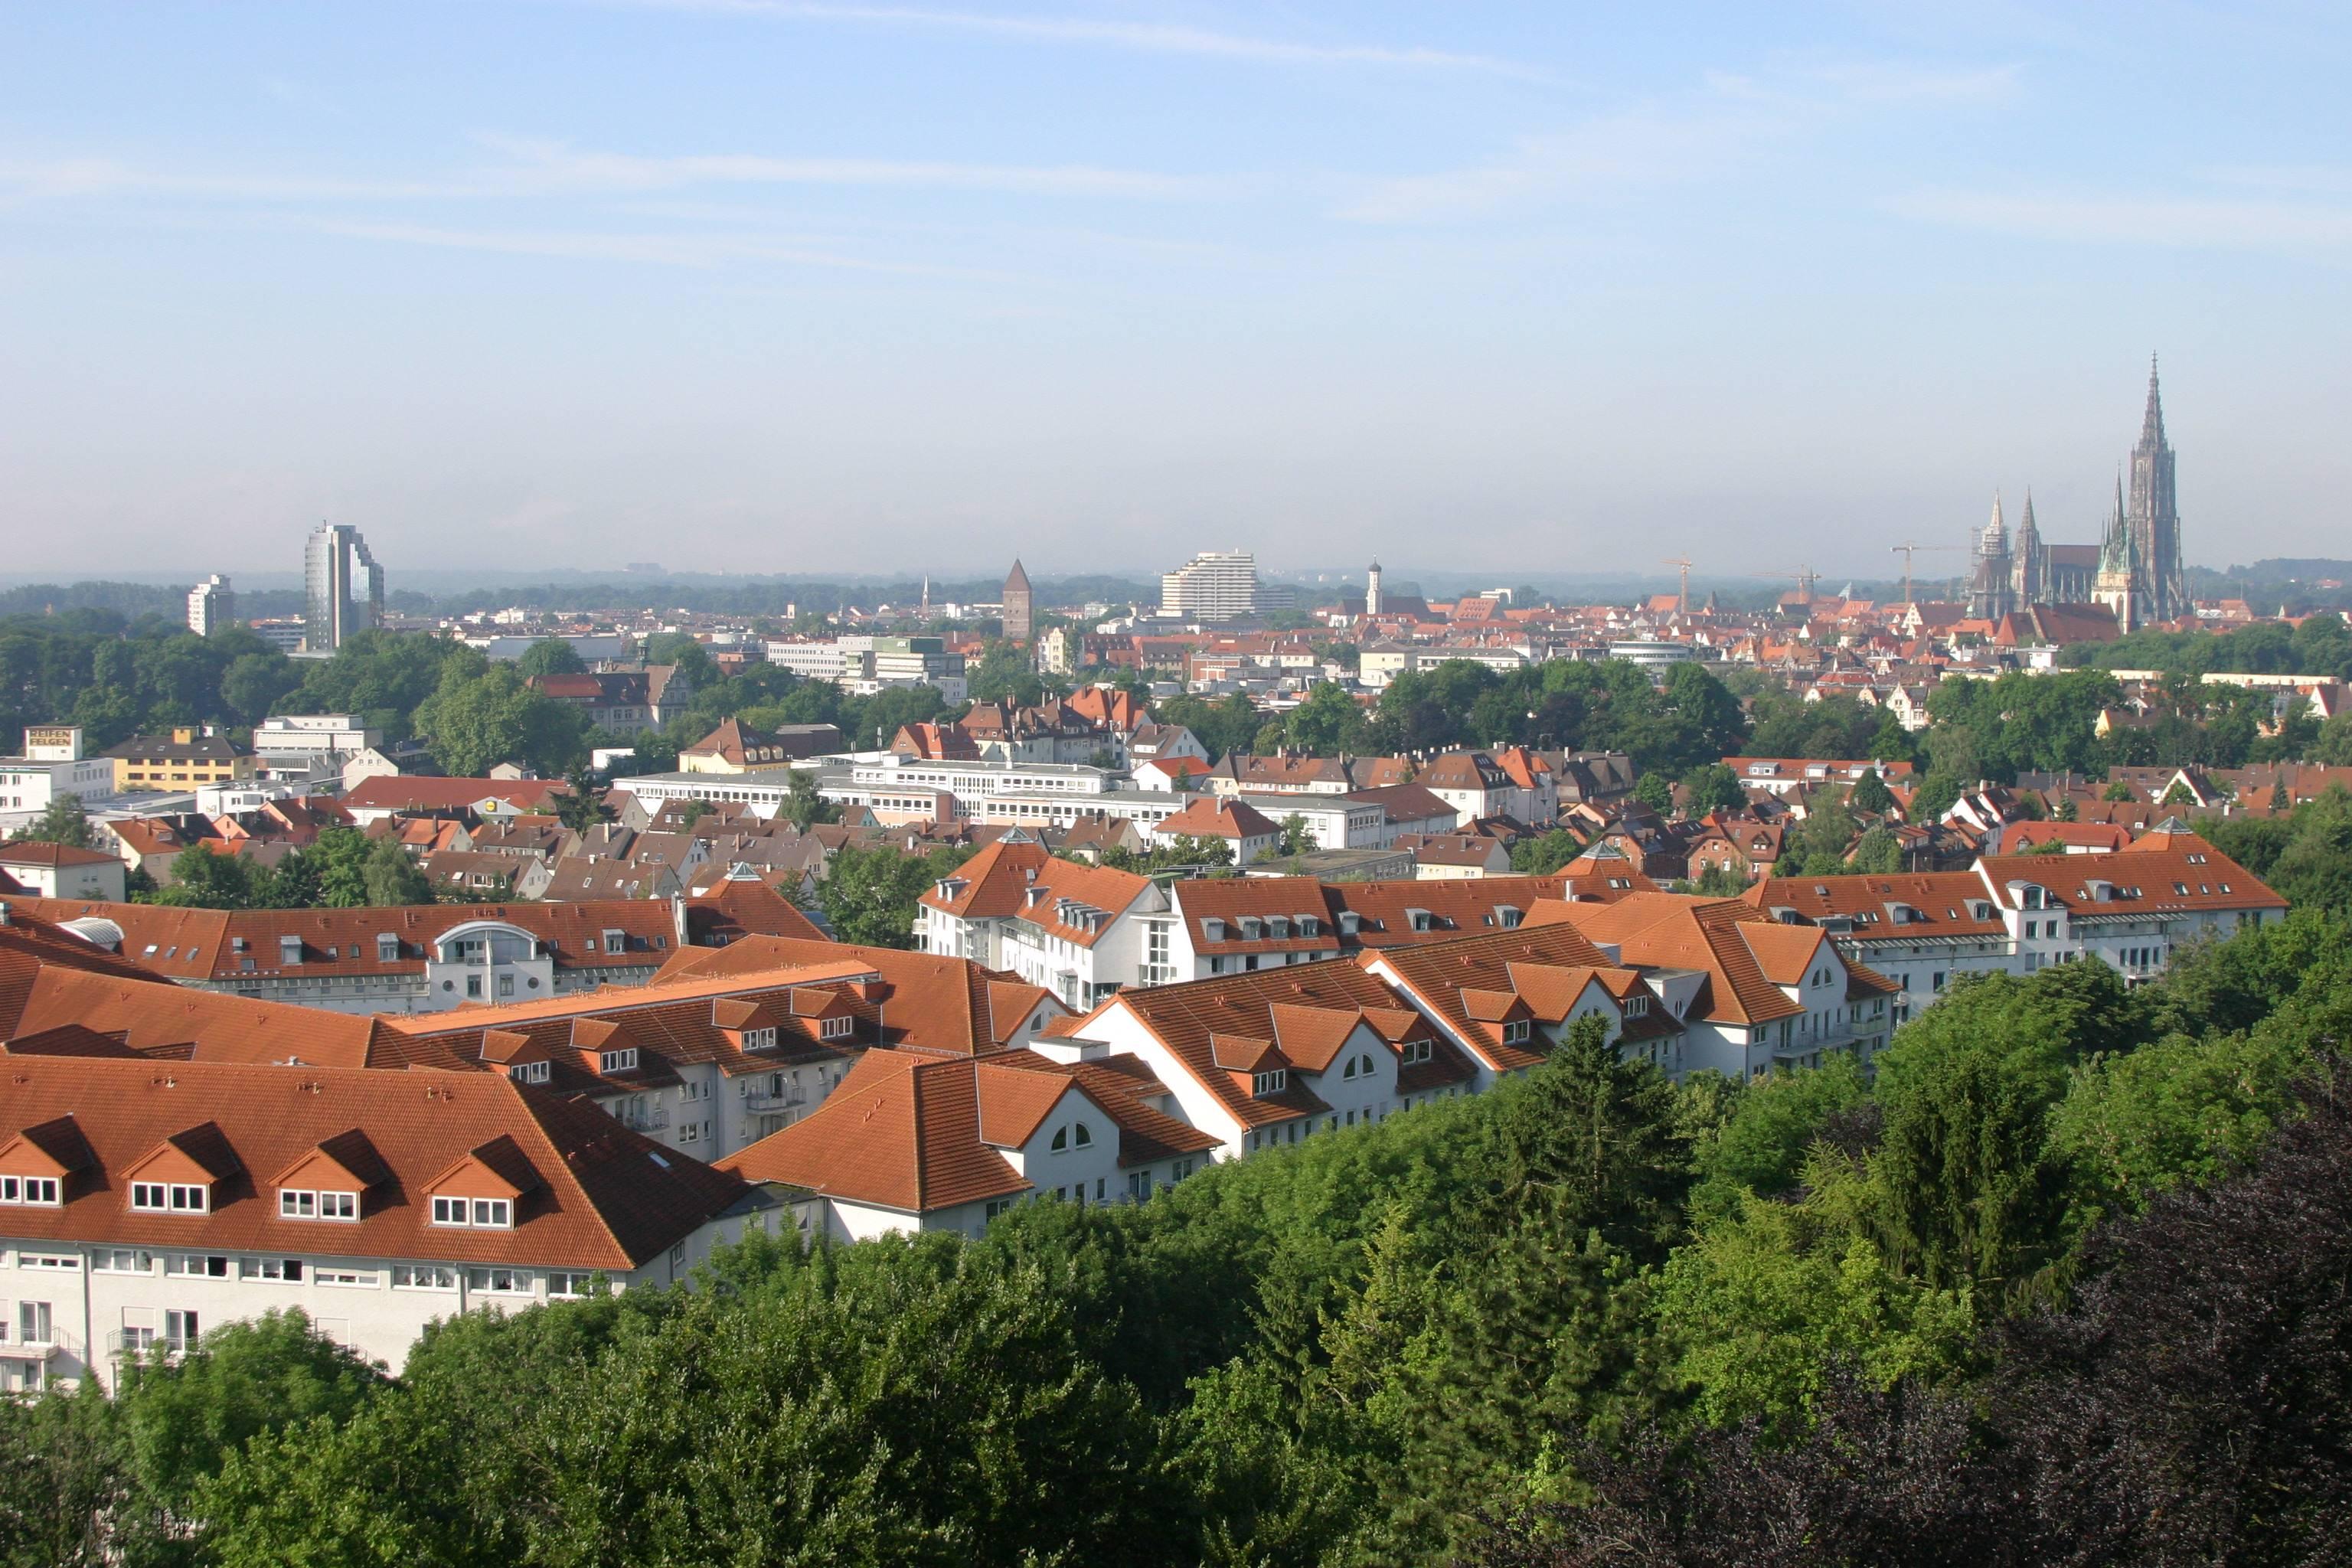 Ulm Oraș Wikipedia